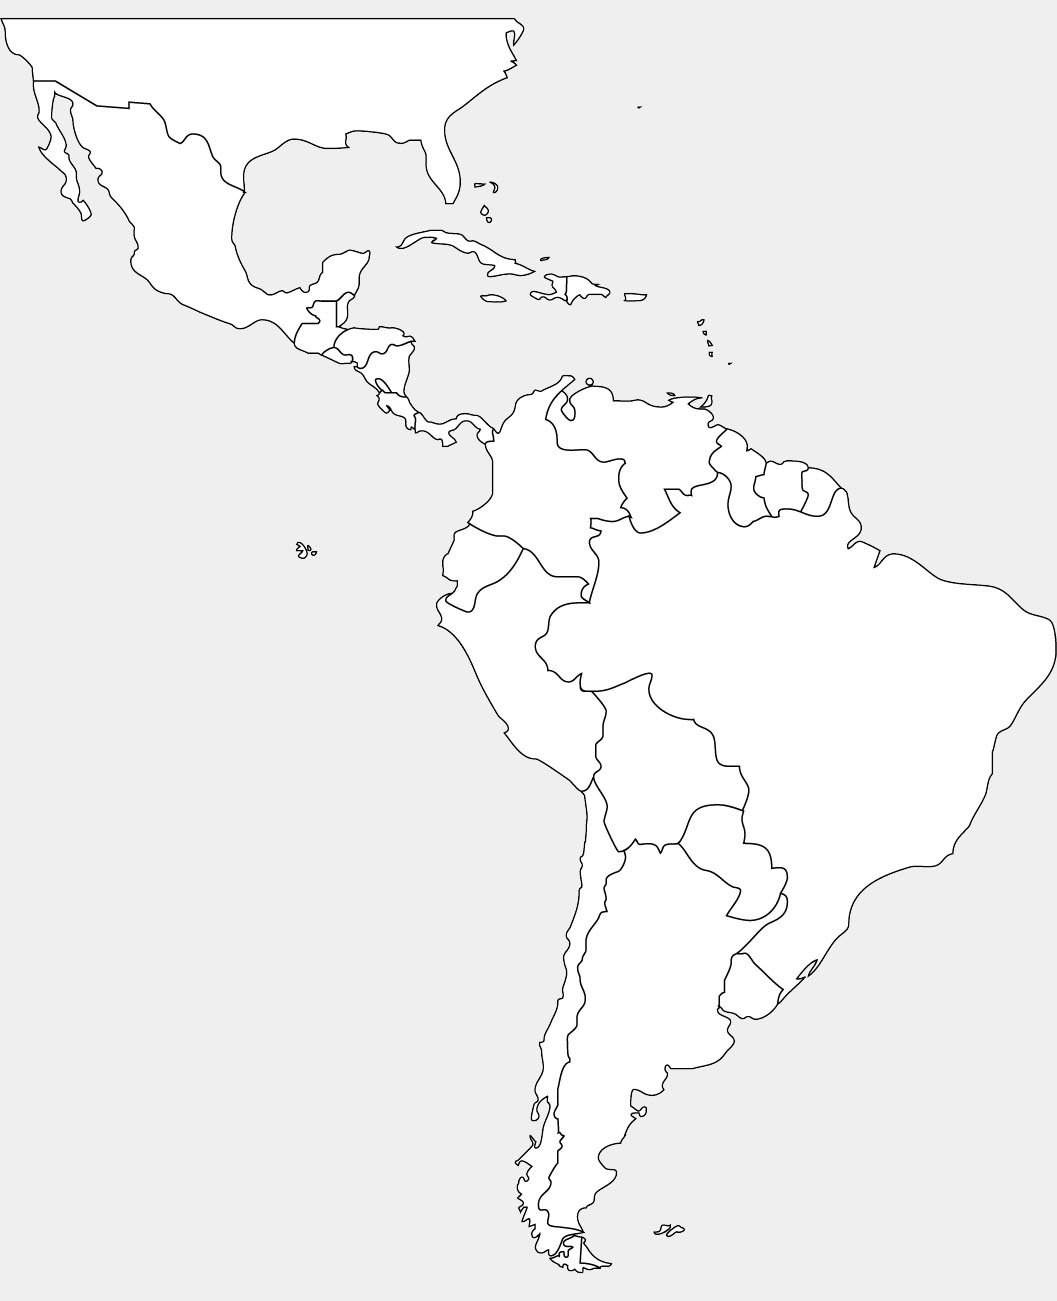 North America Map Drawing At Getdrawings